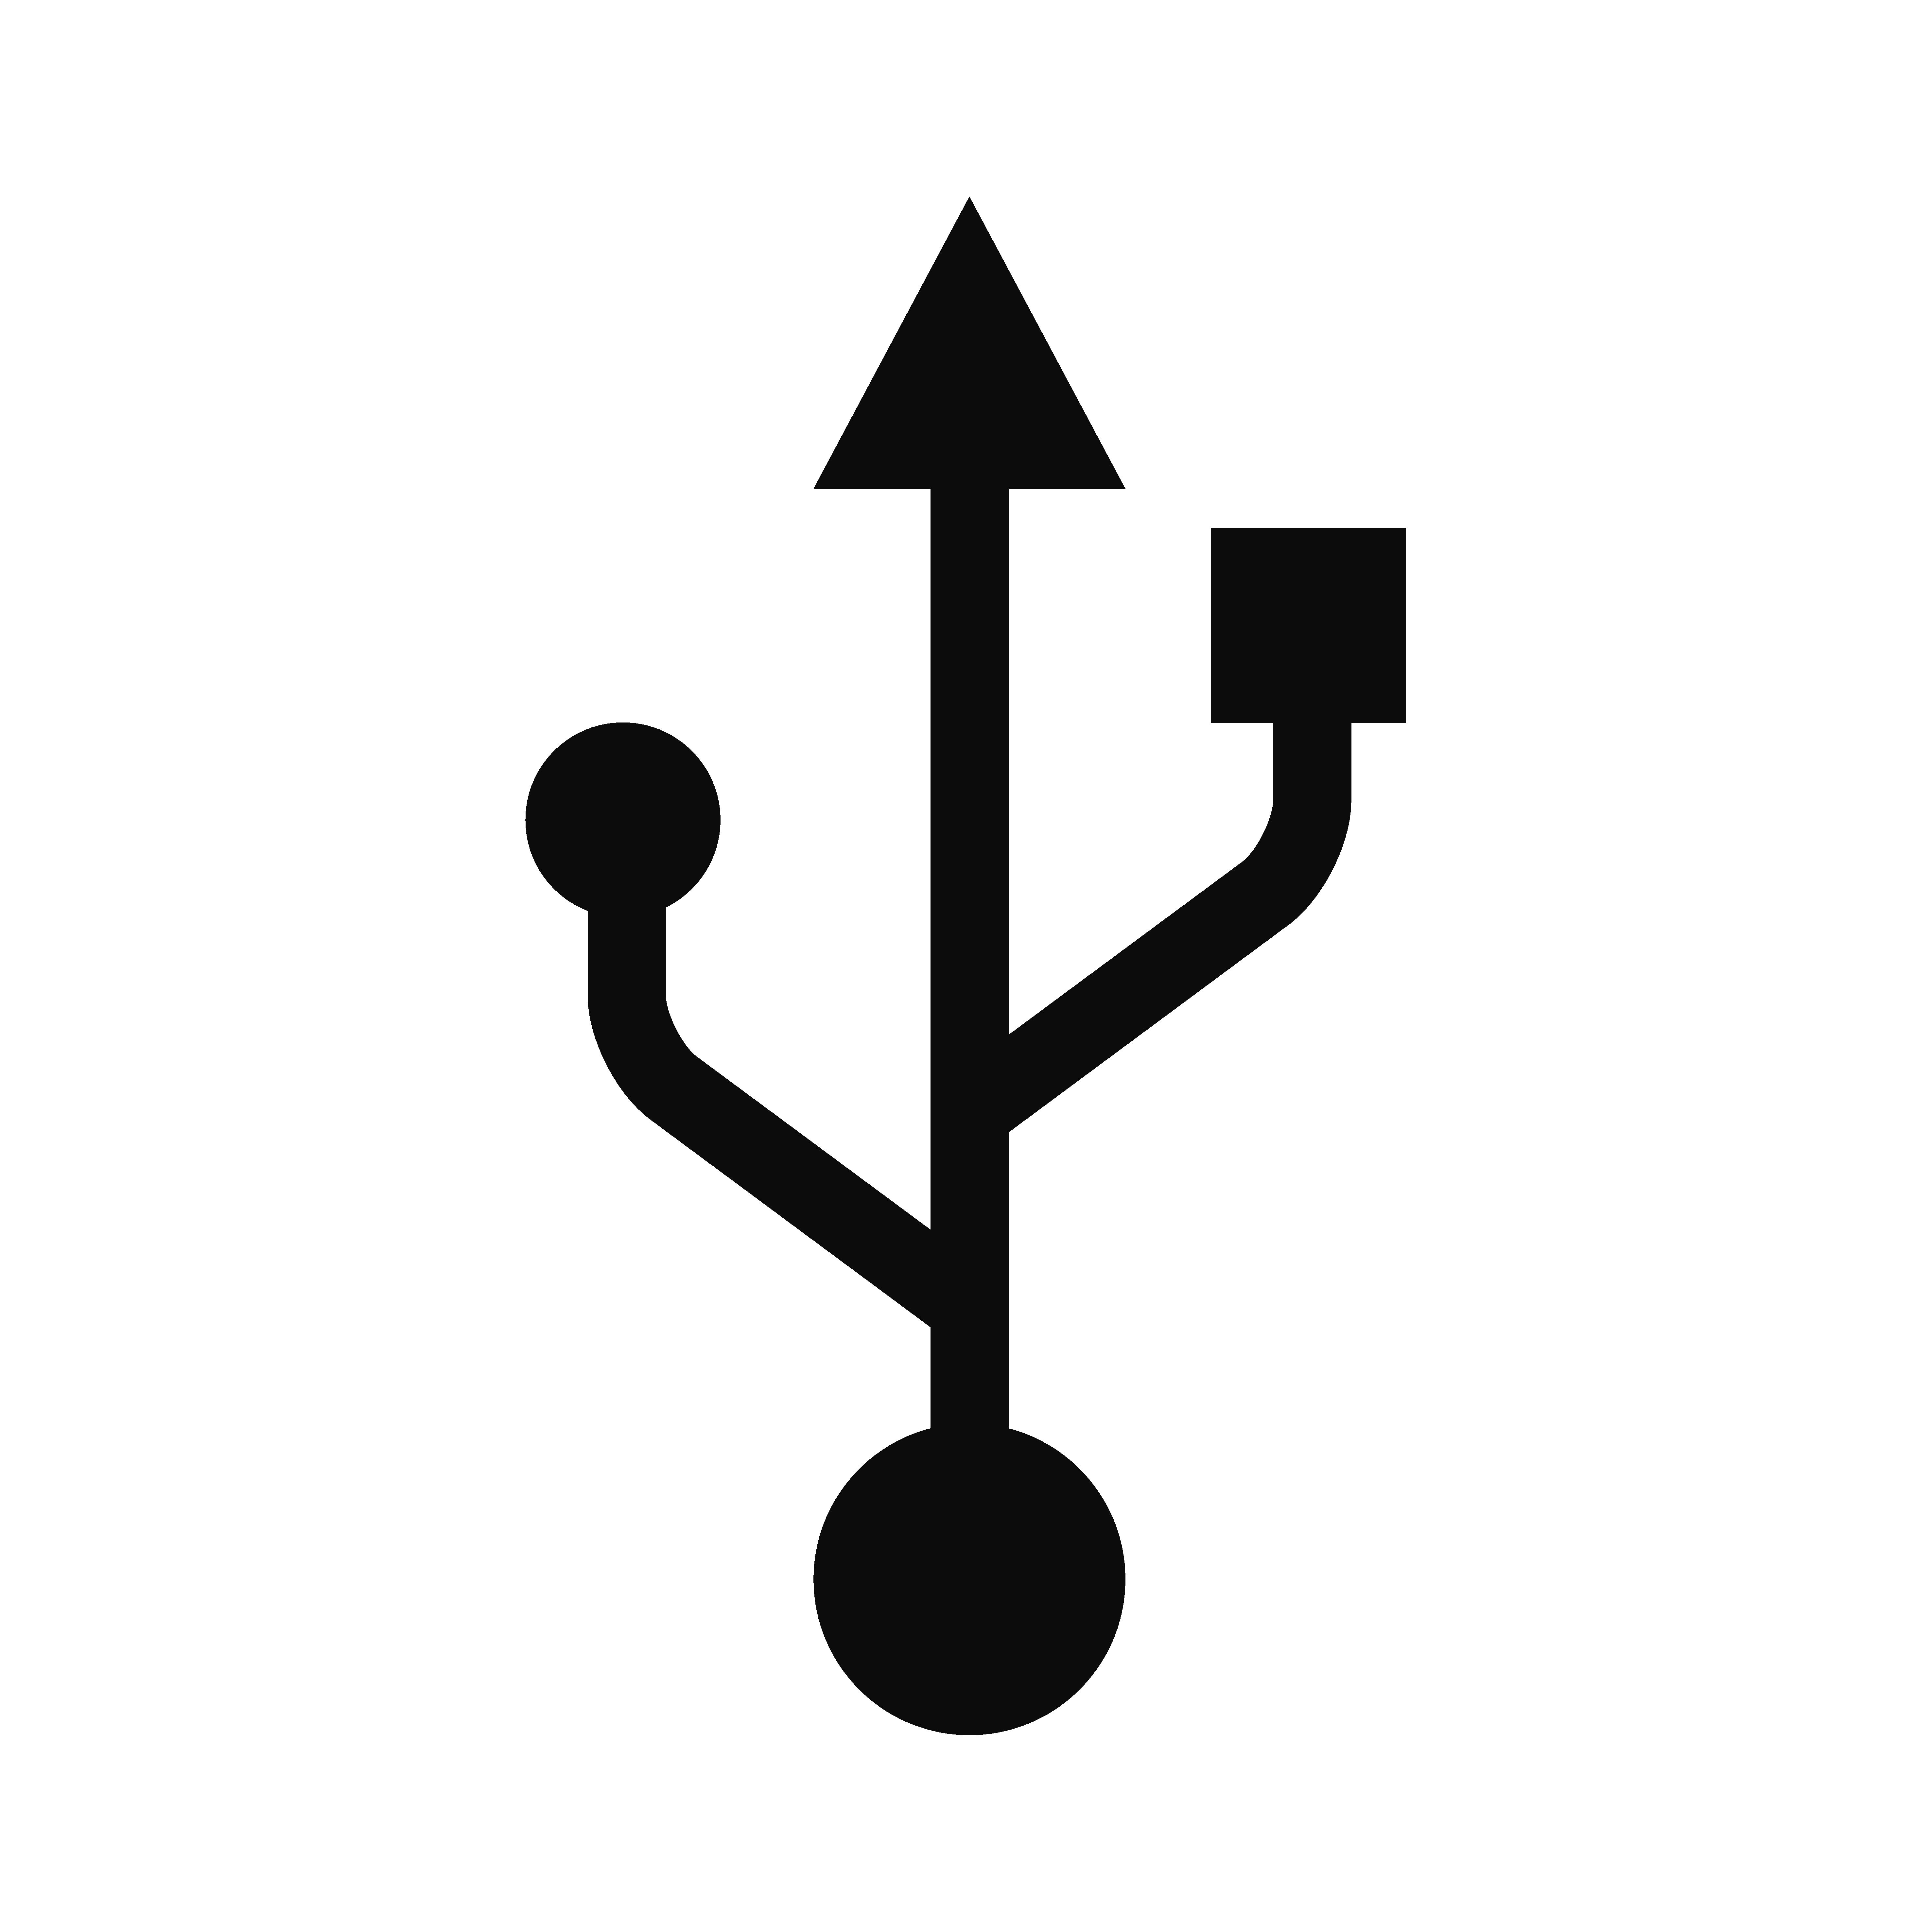 5 Common Computer Symbols Explained